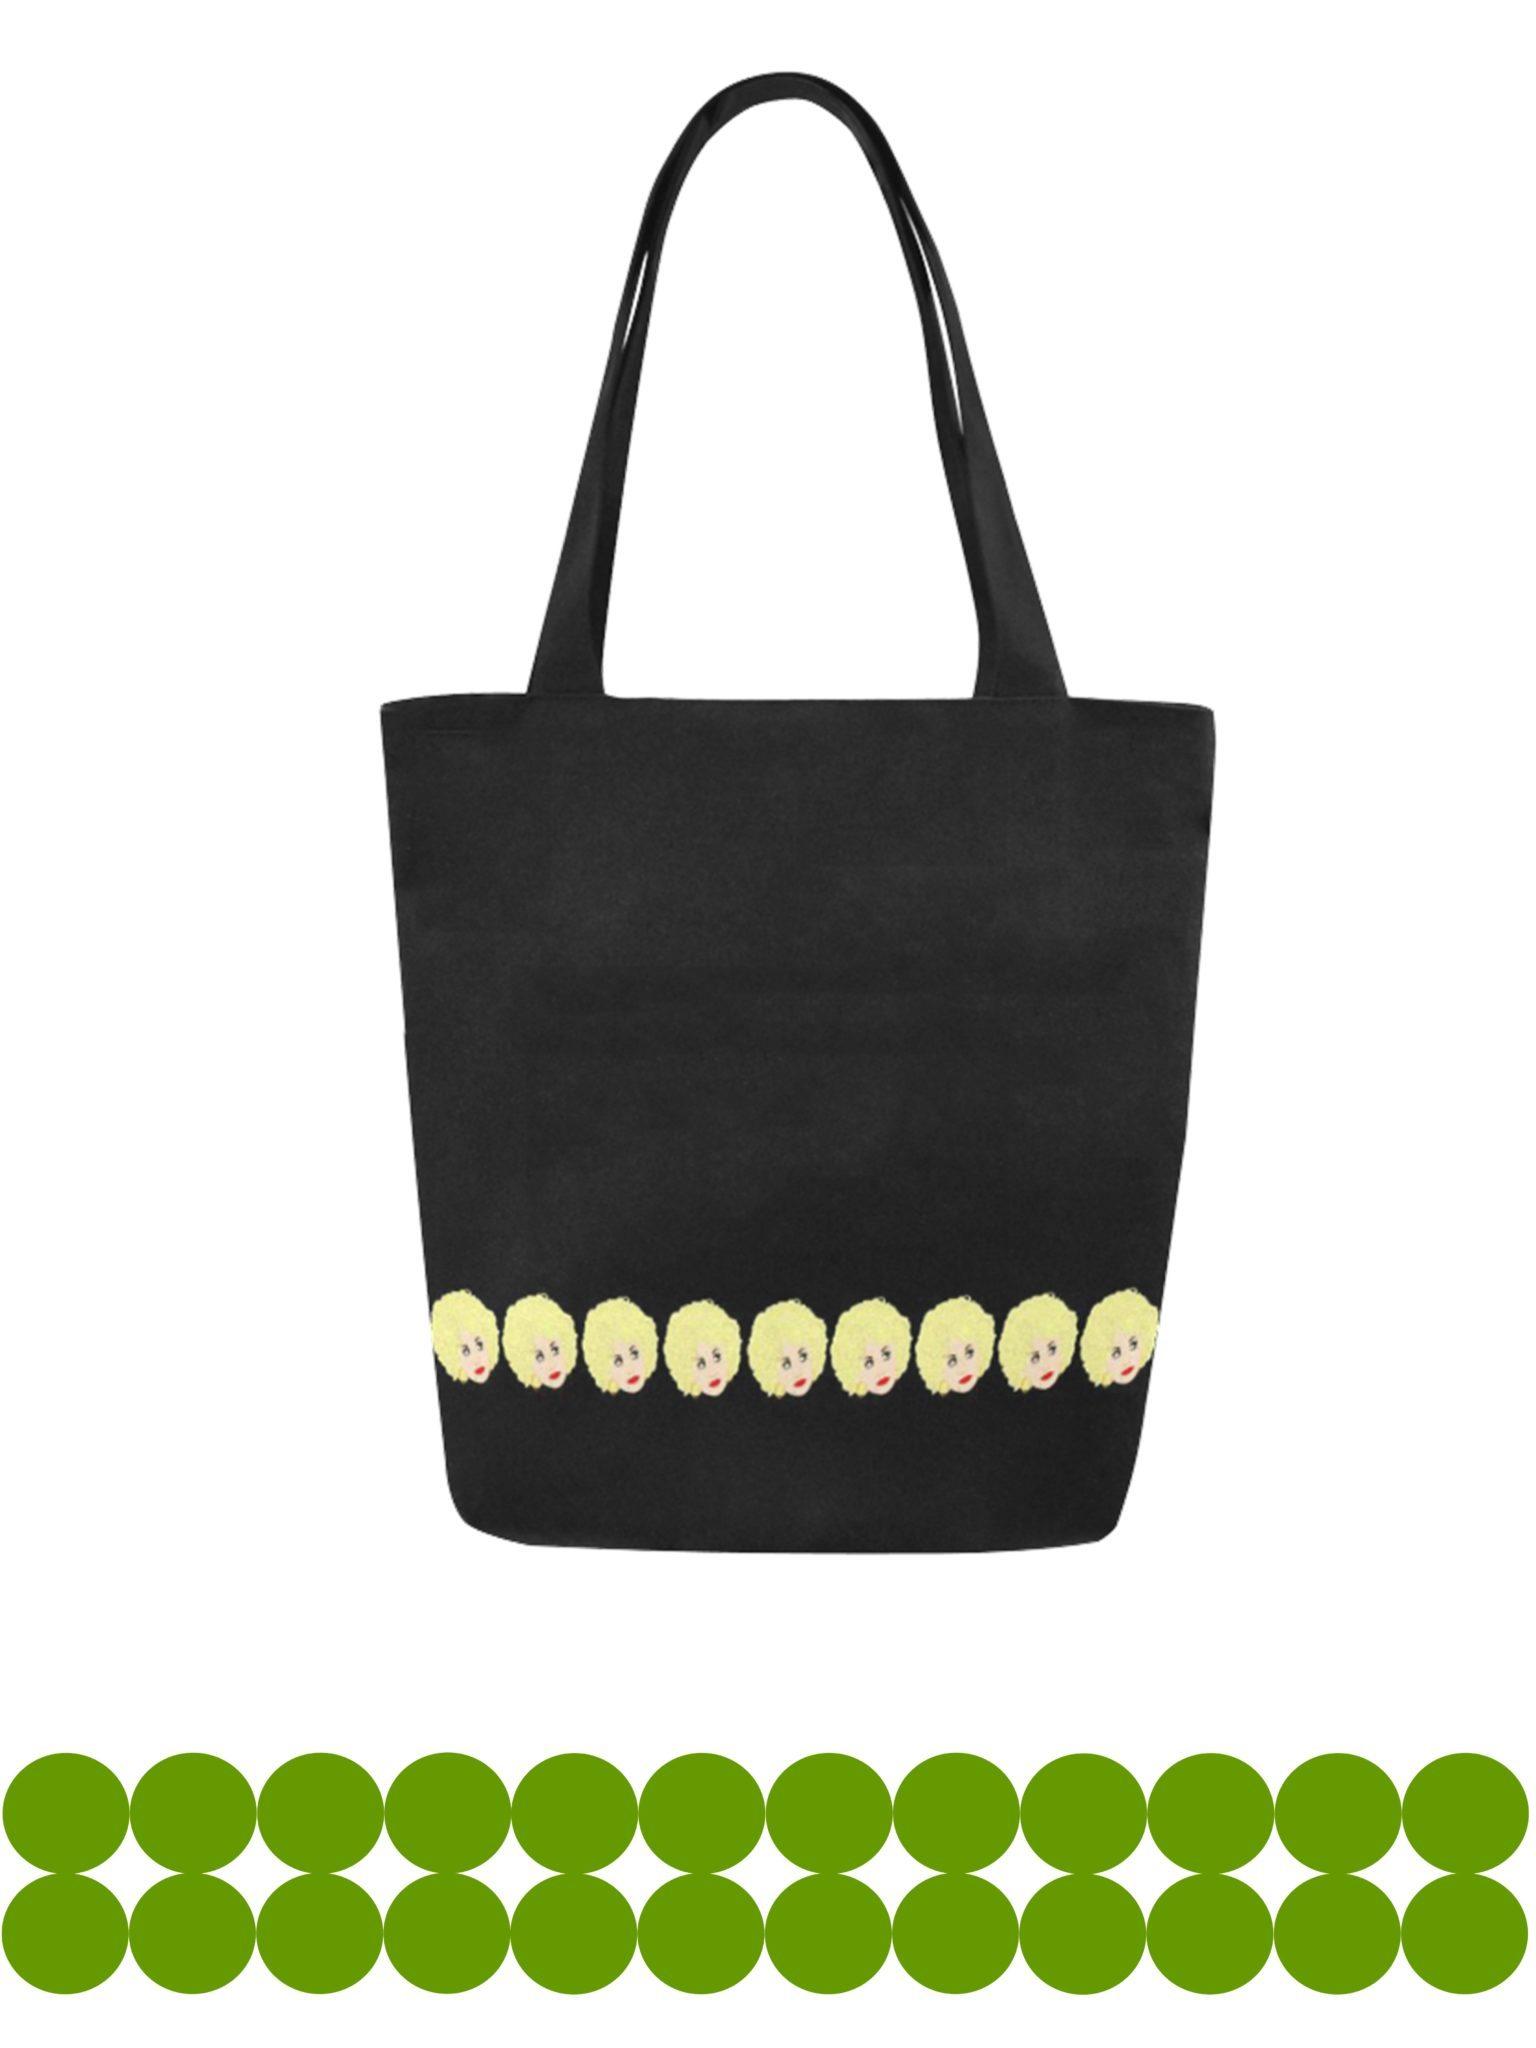 dolly parton canvas tote bag original illustration kayci garline wheatley. Black Bedroom Furniture Sets. Home Design Ideas